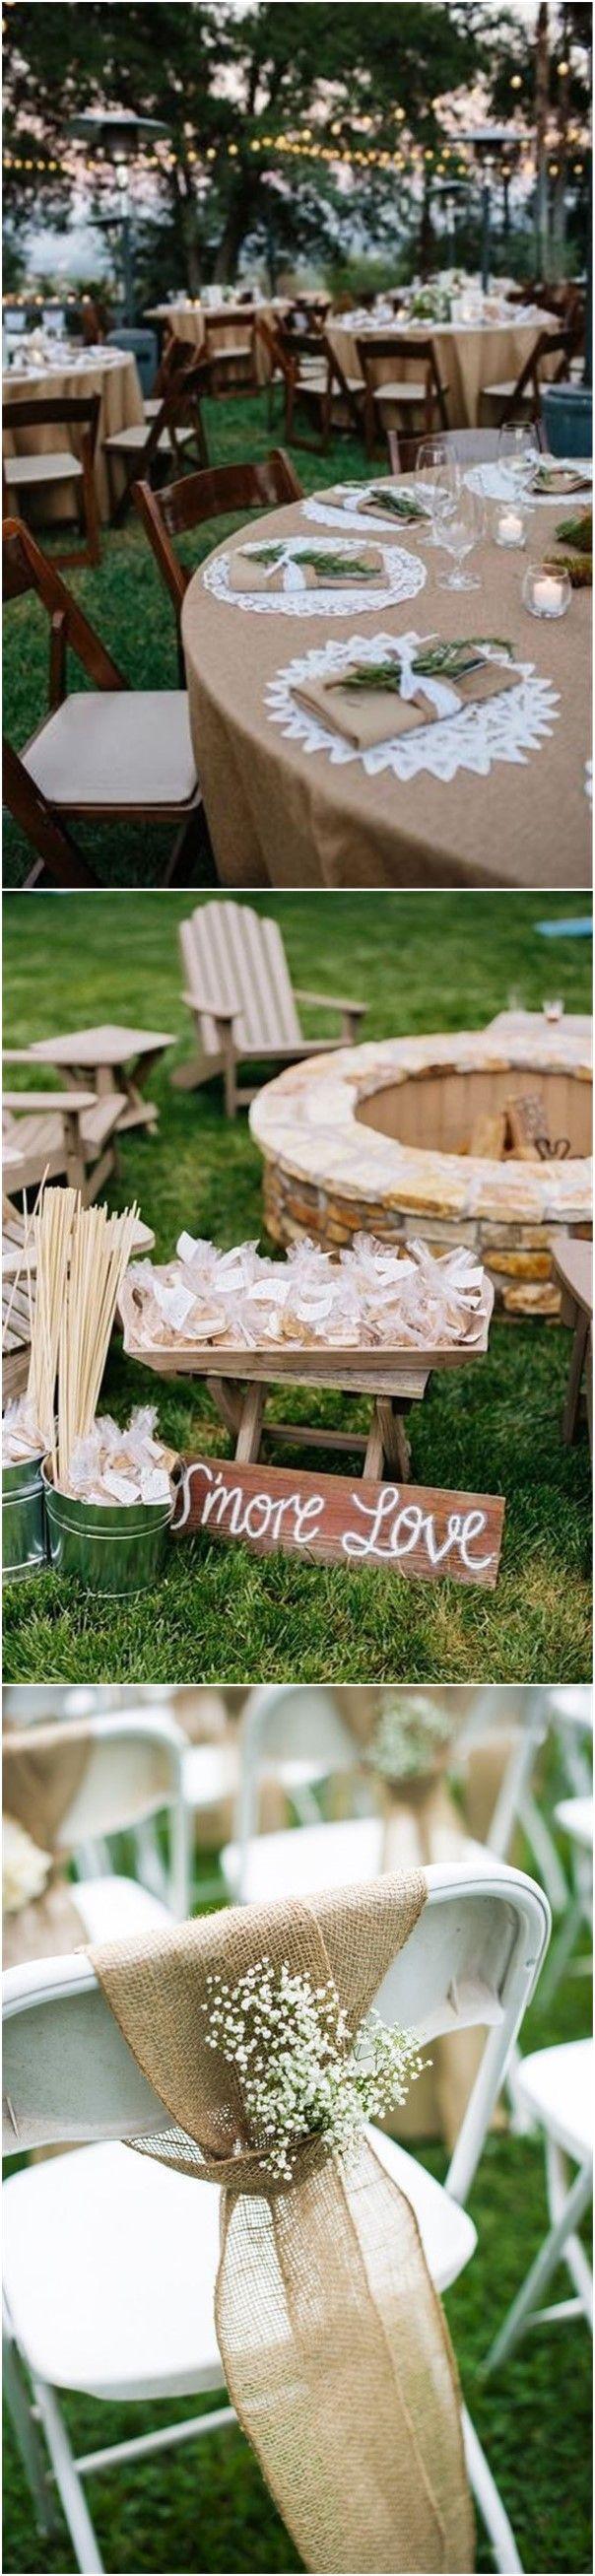 806 best rustic weddings images on pinterest rustic barn